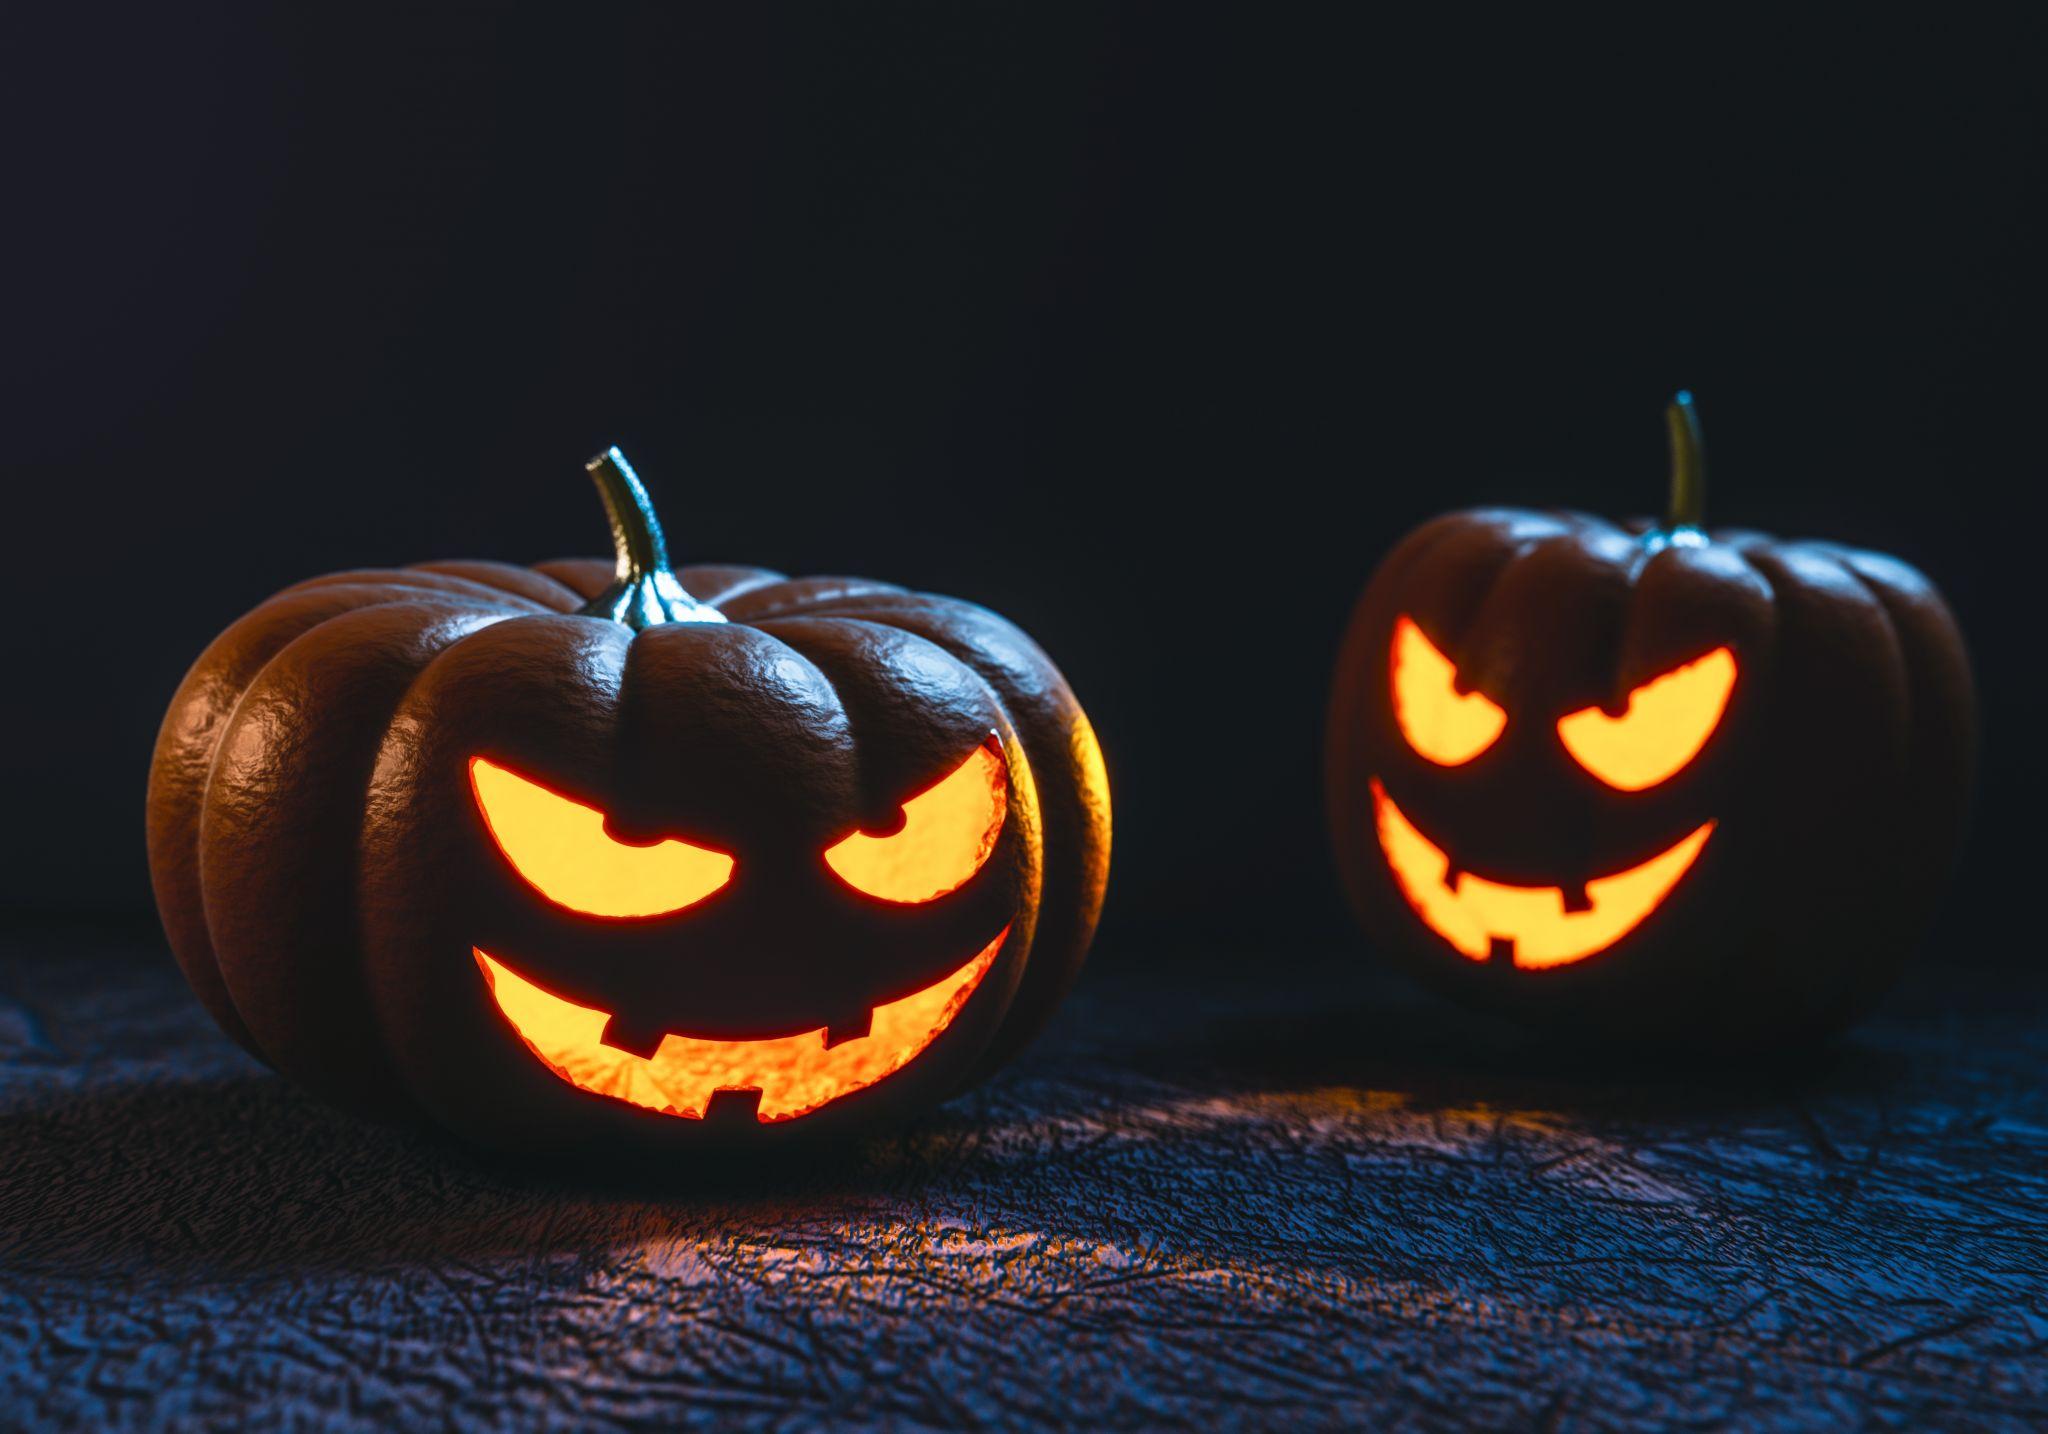 Two spooky Halloween pumpkins